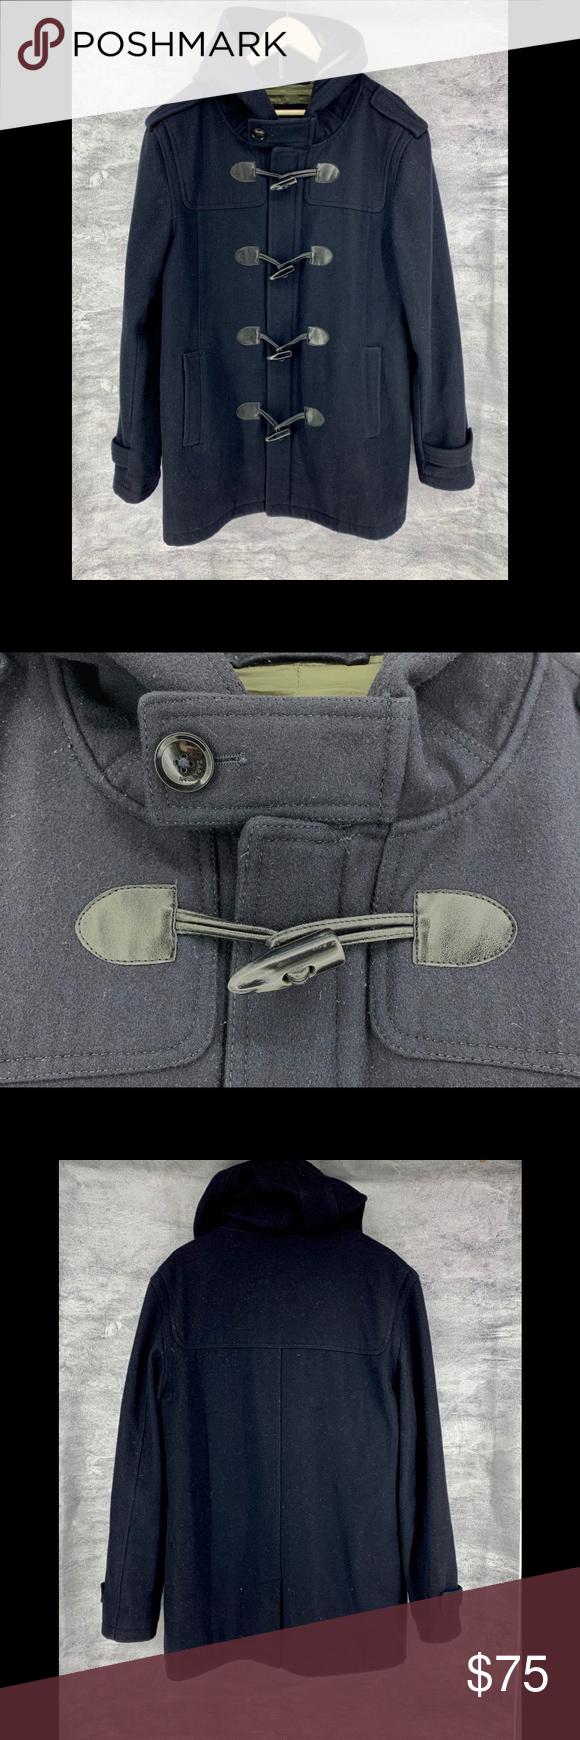 Zara Mens Toggle Coat W/Hood Size XL Color Black Zara Wool